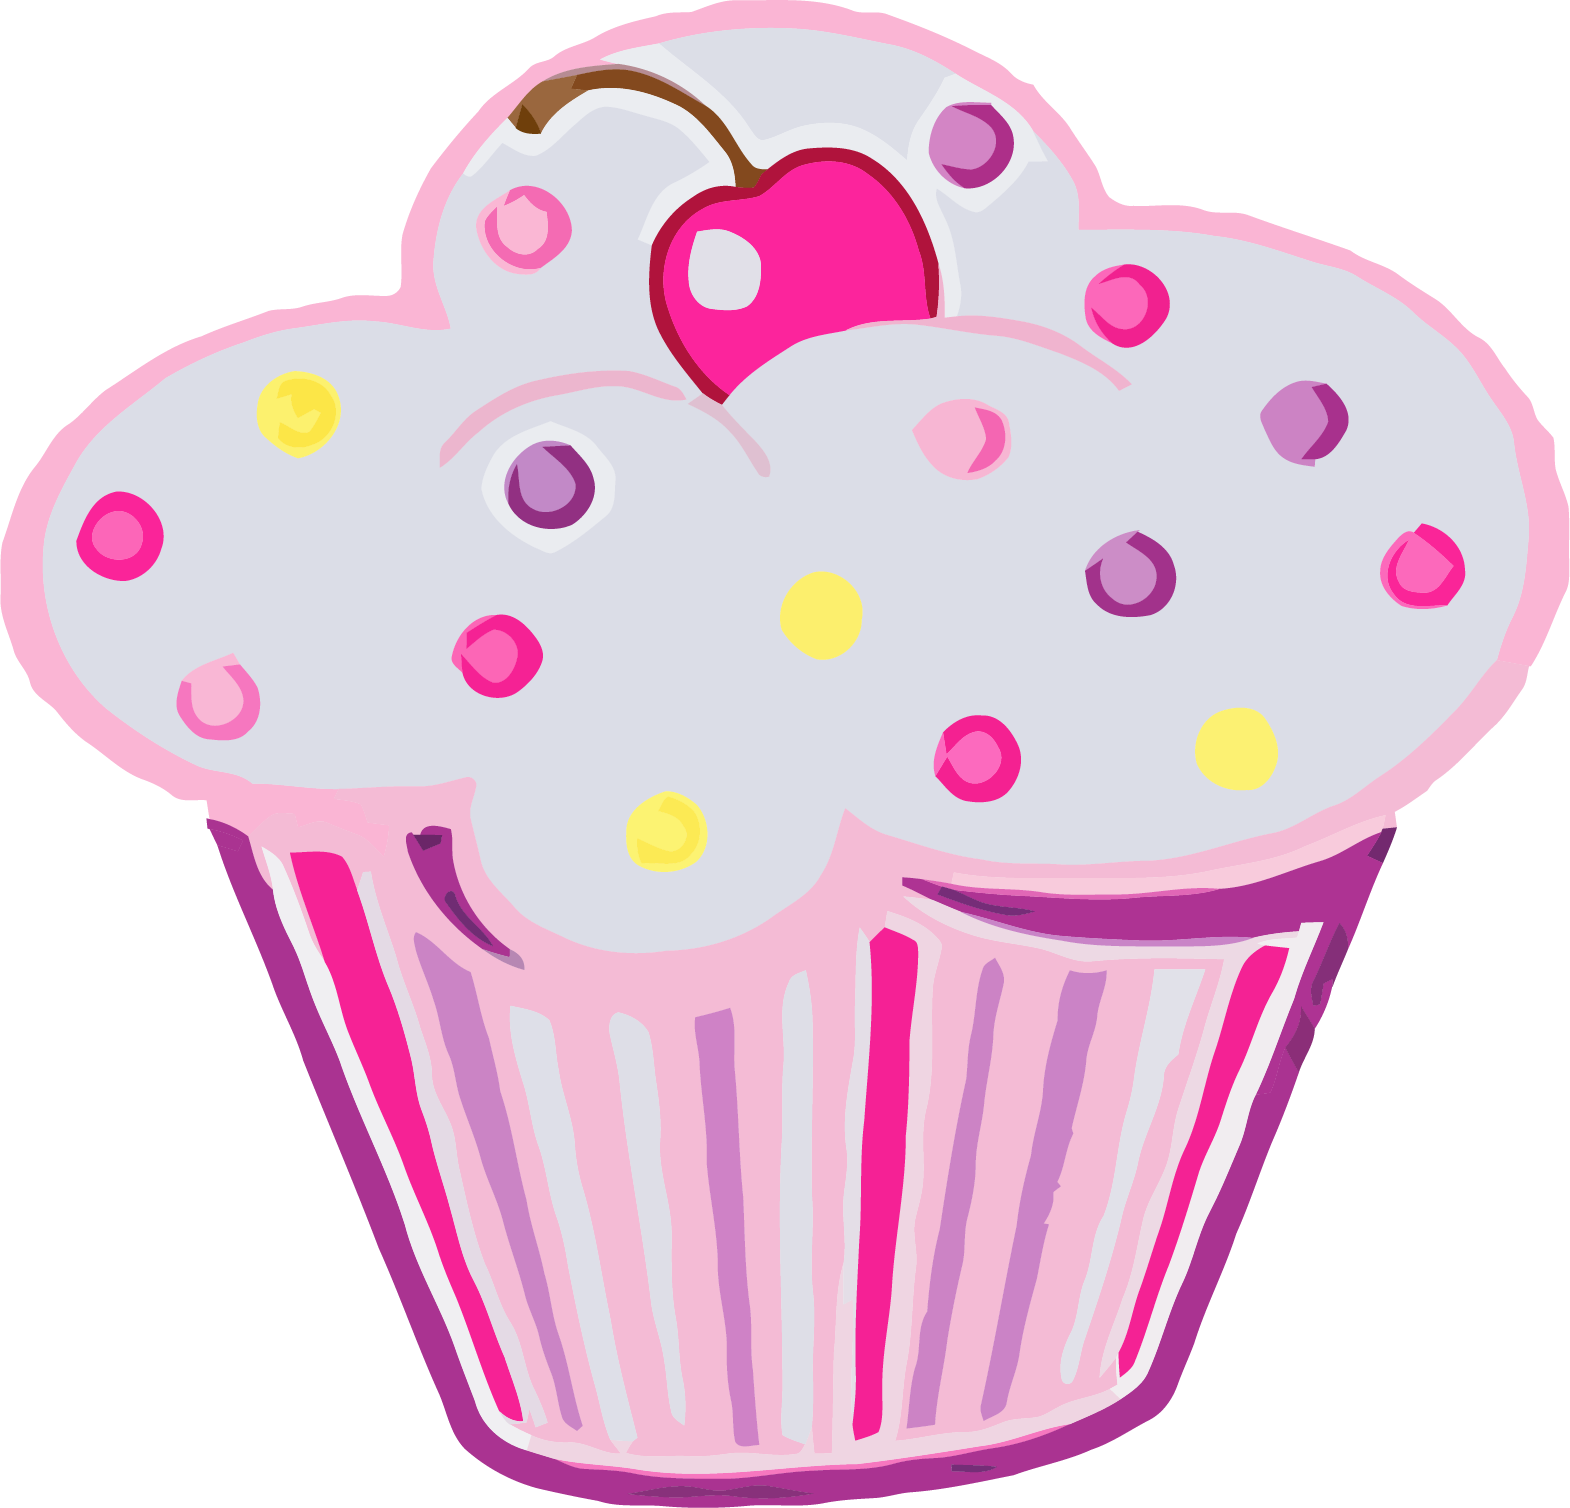 Png jokingart com download. Coloring clipart cupcake